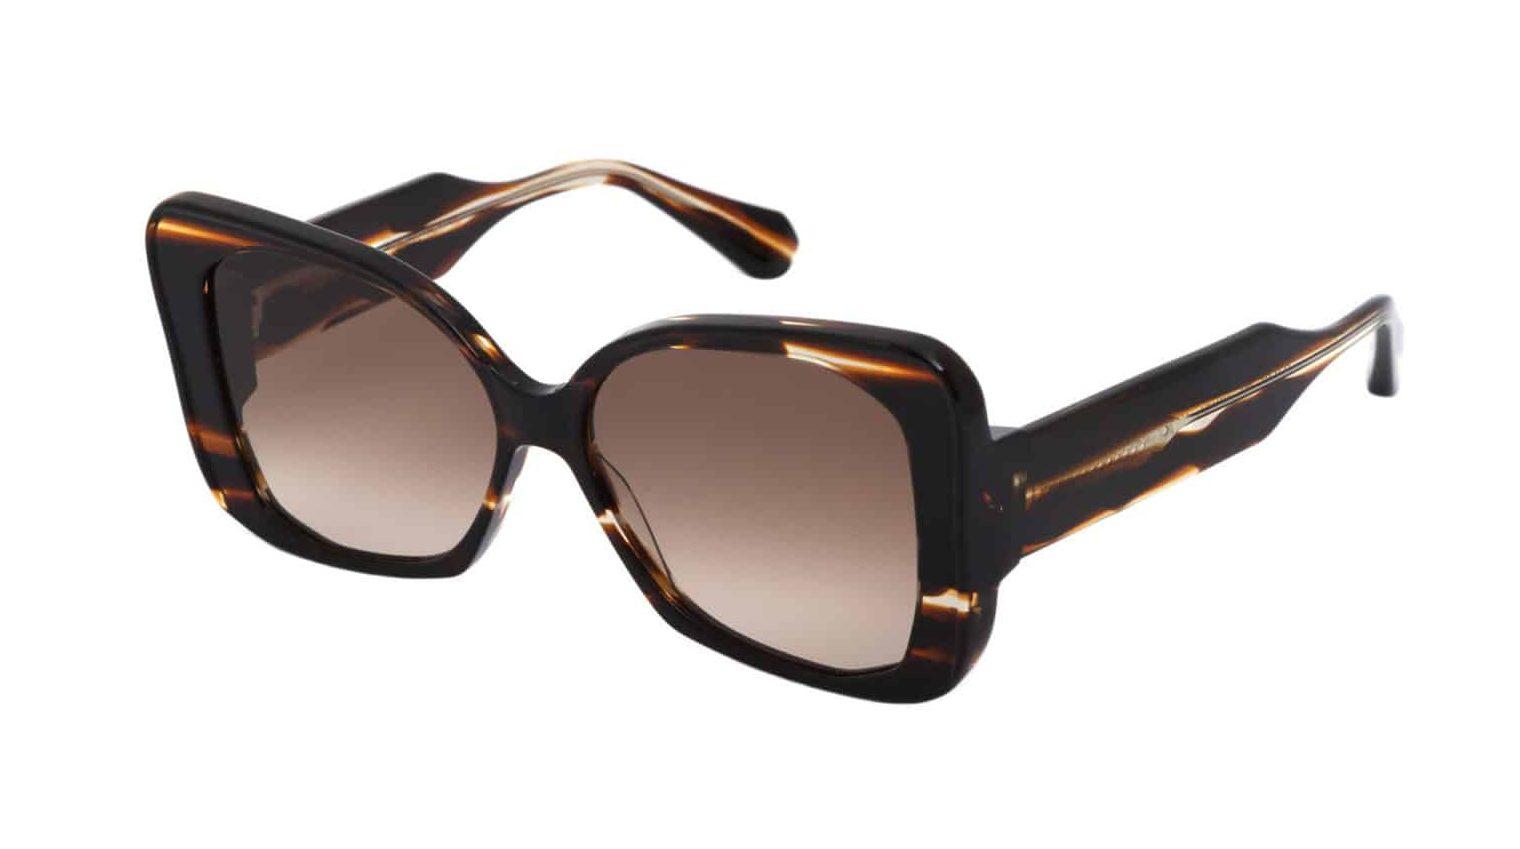 6507-2-amanda-geometric-tortoise-sunglasses-by-gigi-studios-3-scaled-2048×1366